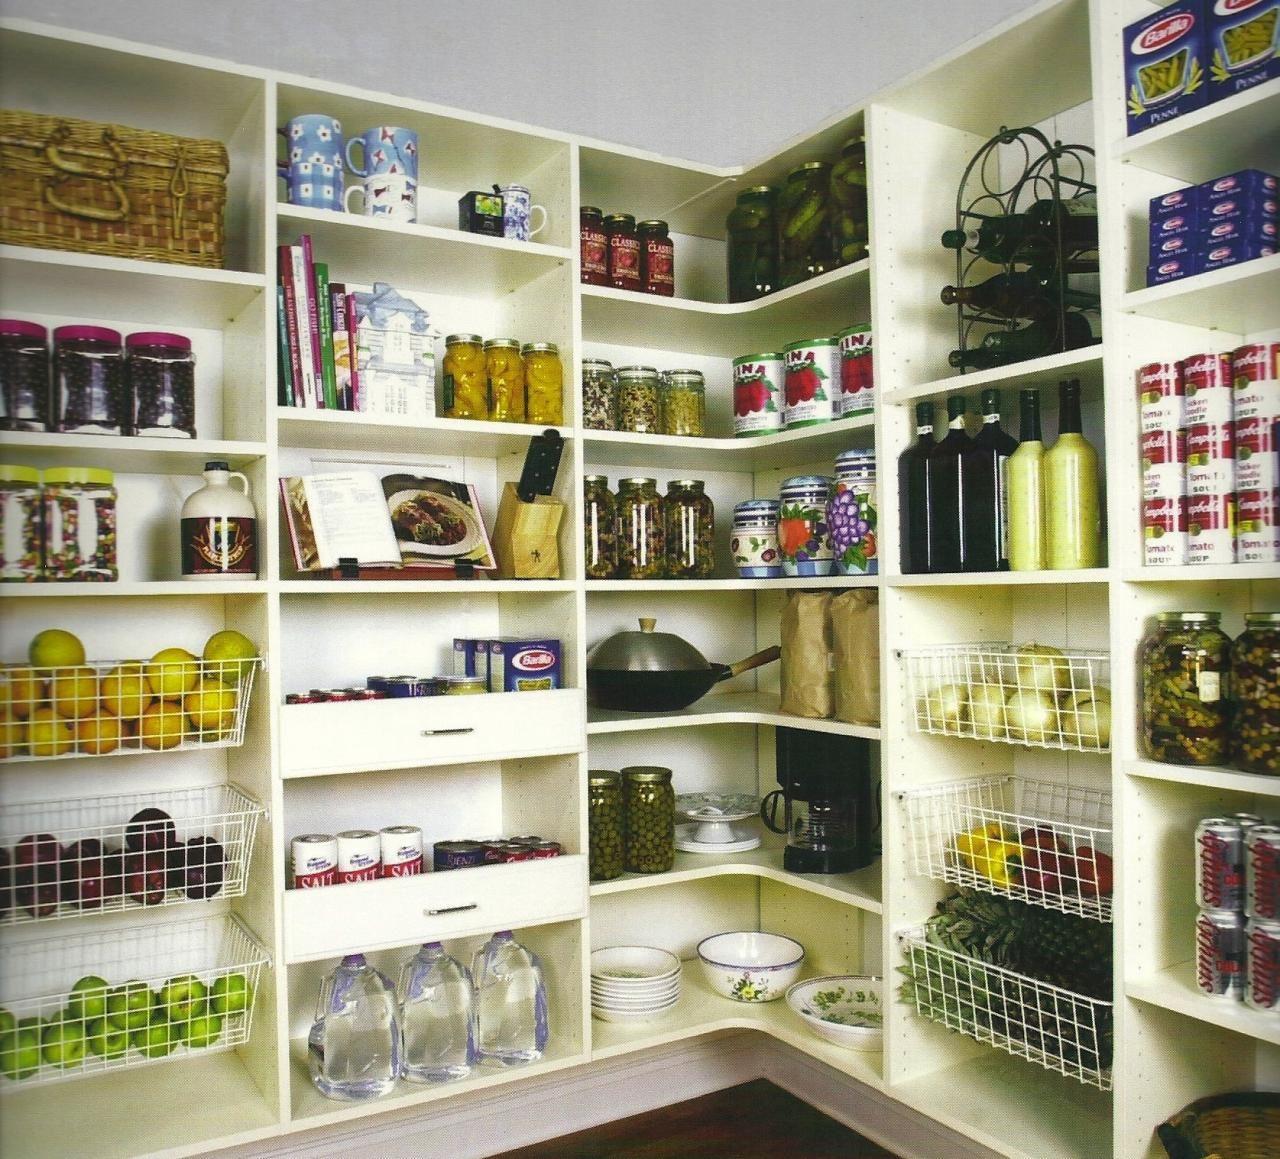 corner walk in pantry designs 575 corner walk in pantry design ideas - Pantry Designs Ideas